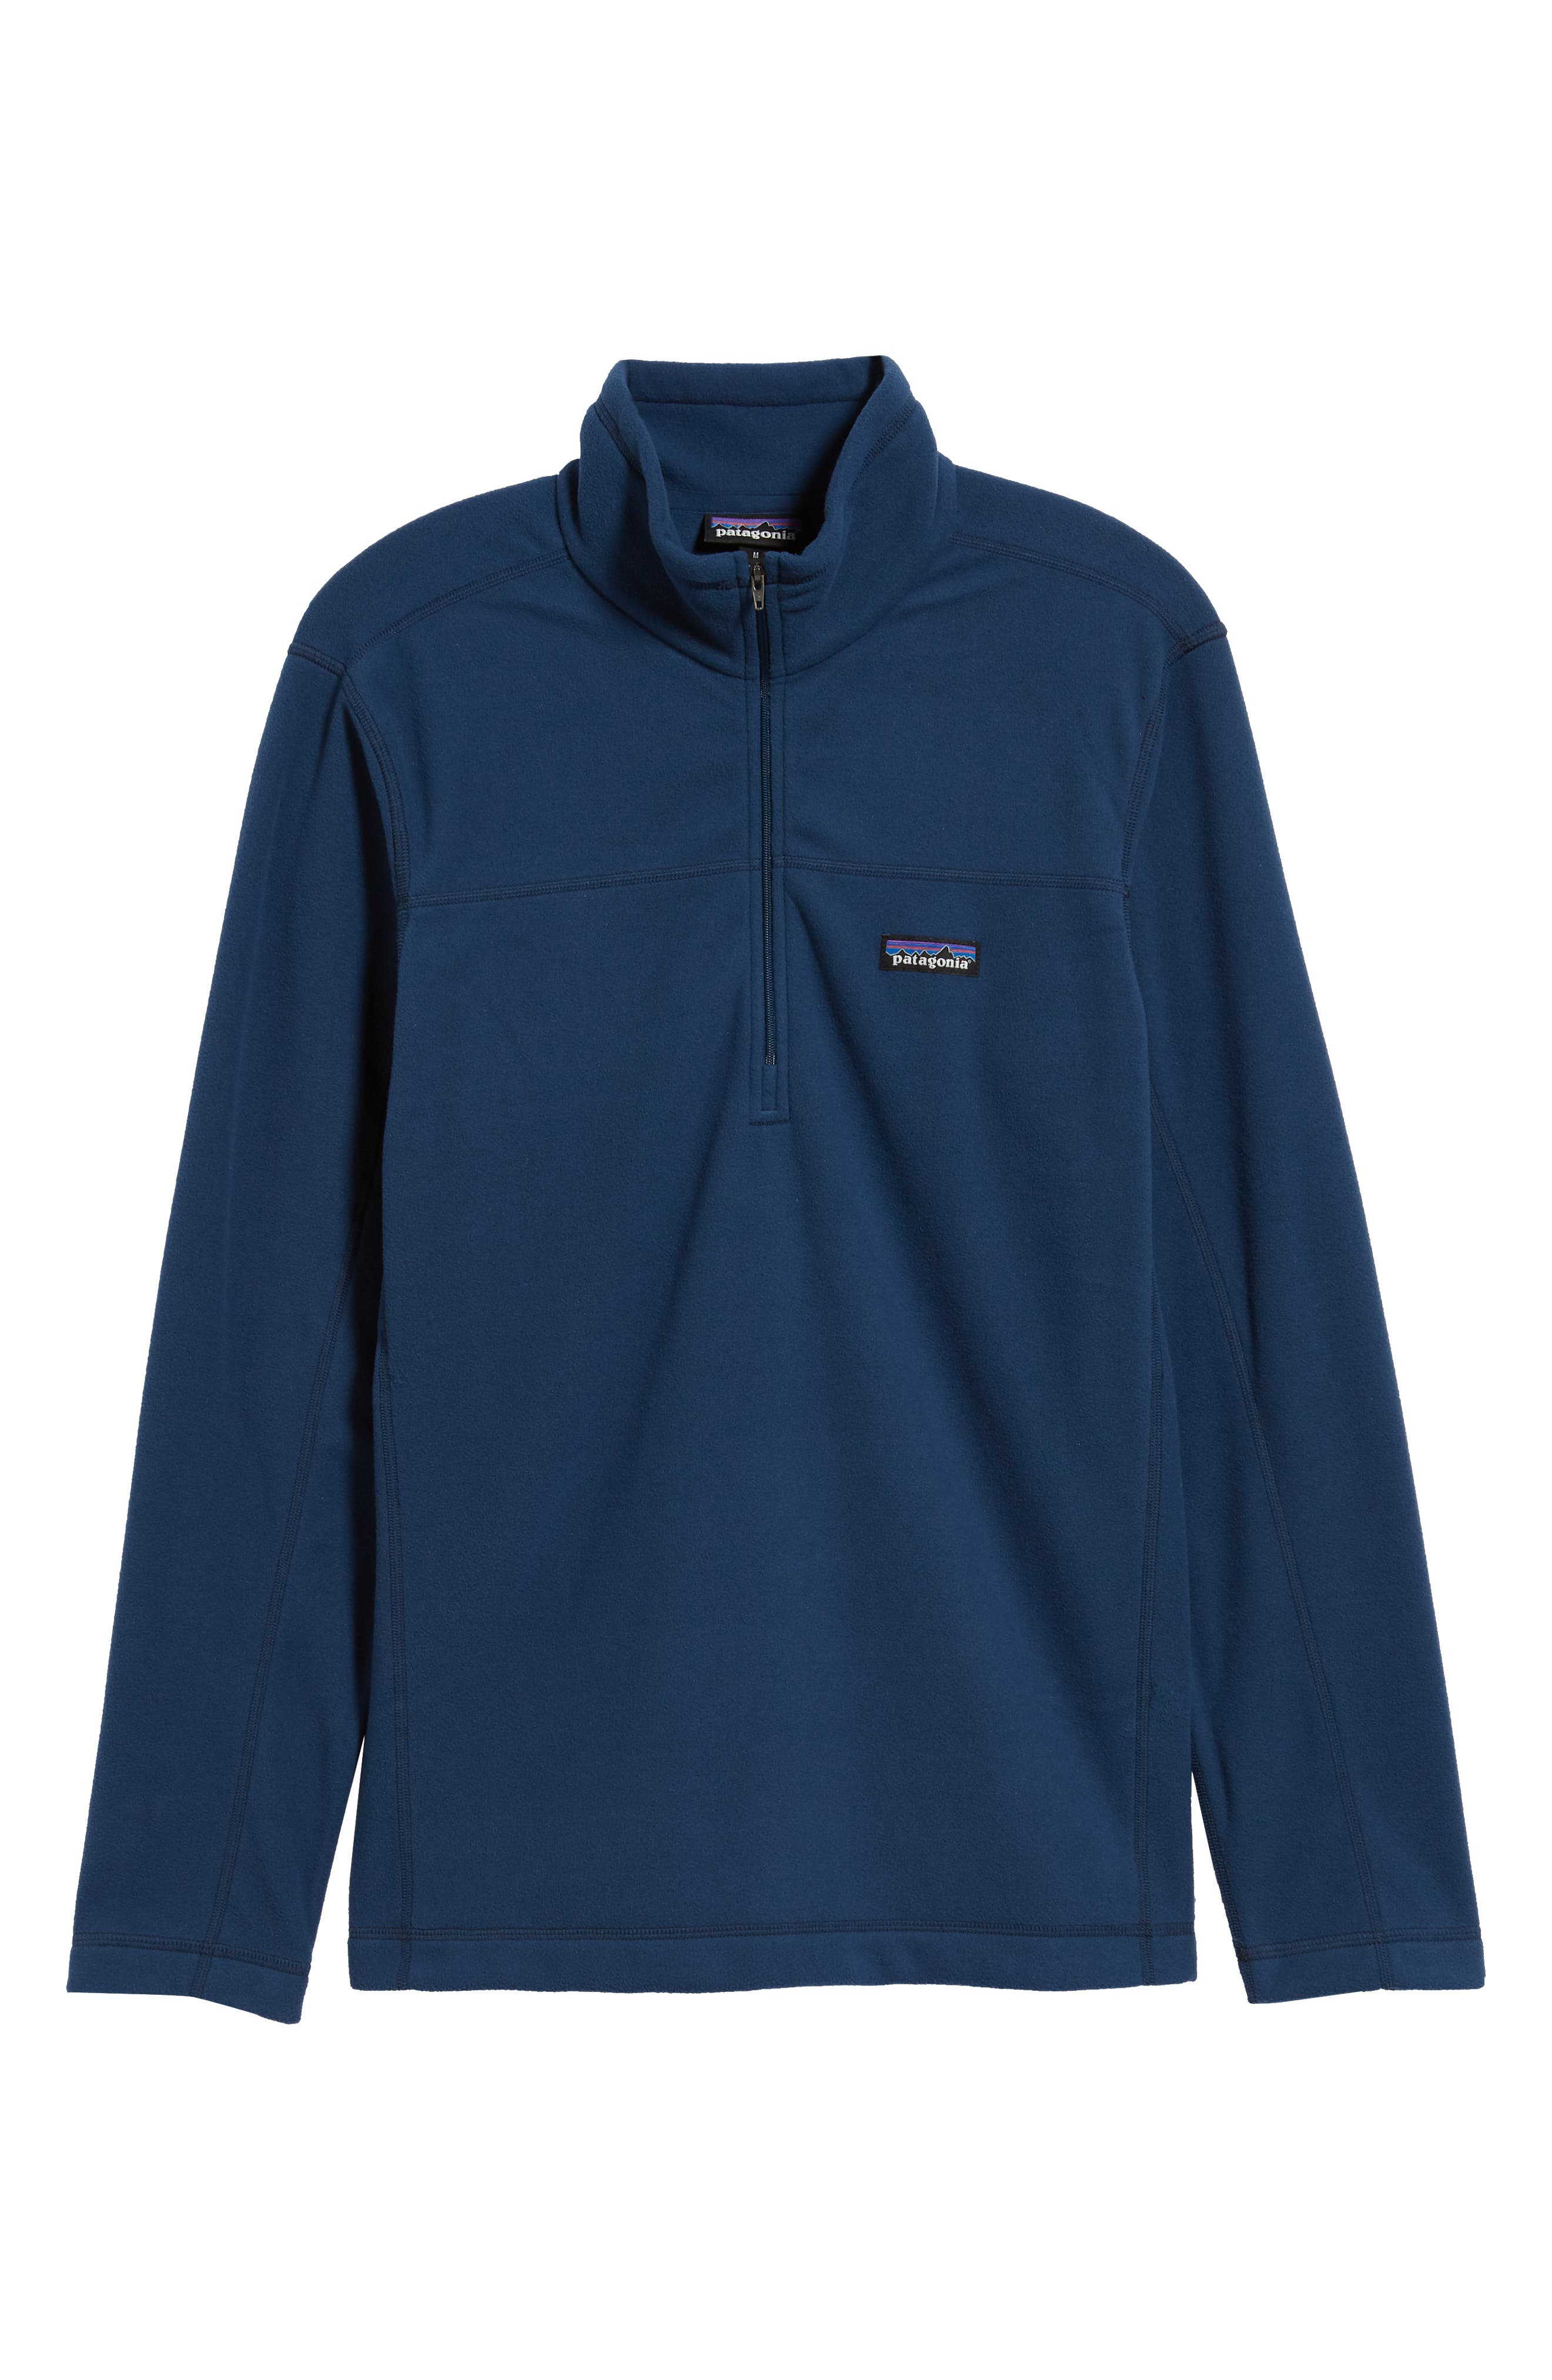 Fleece Pullover,                             Alternate thumbnail 6, color,                             STONE BLUE